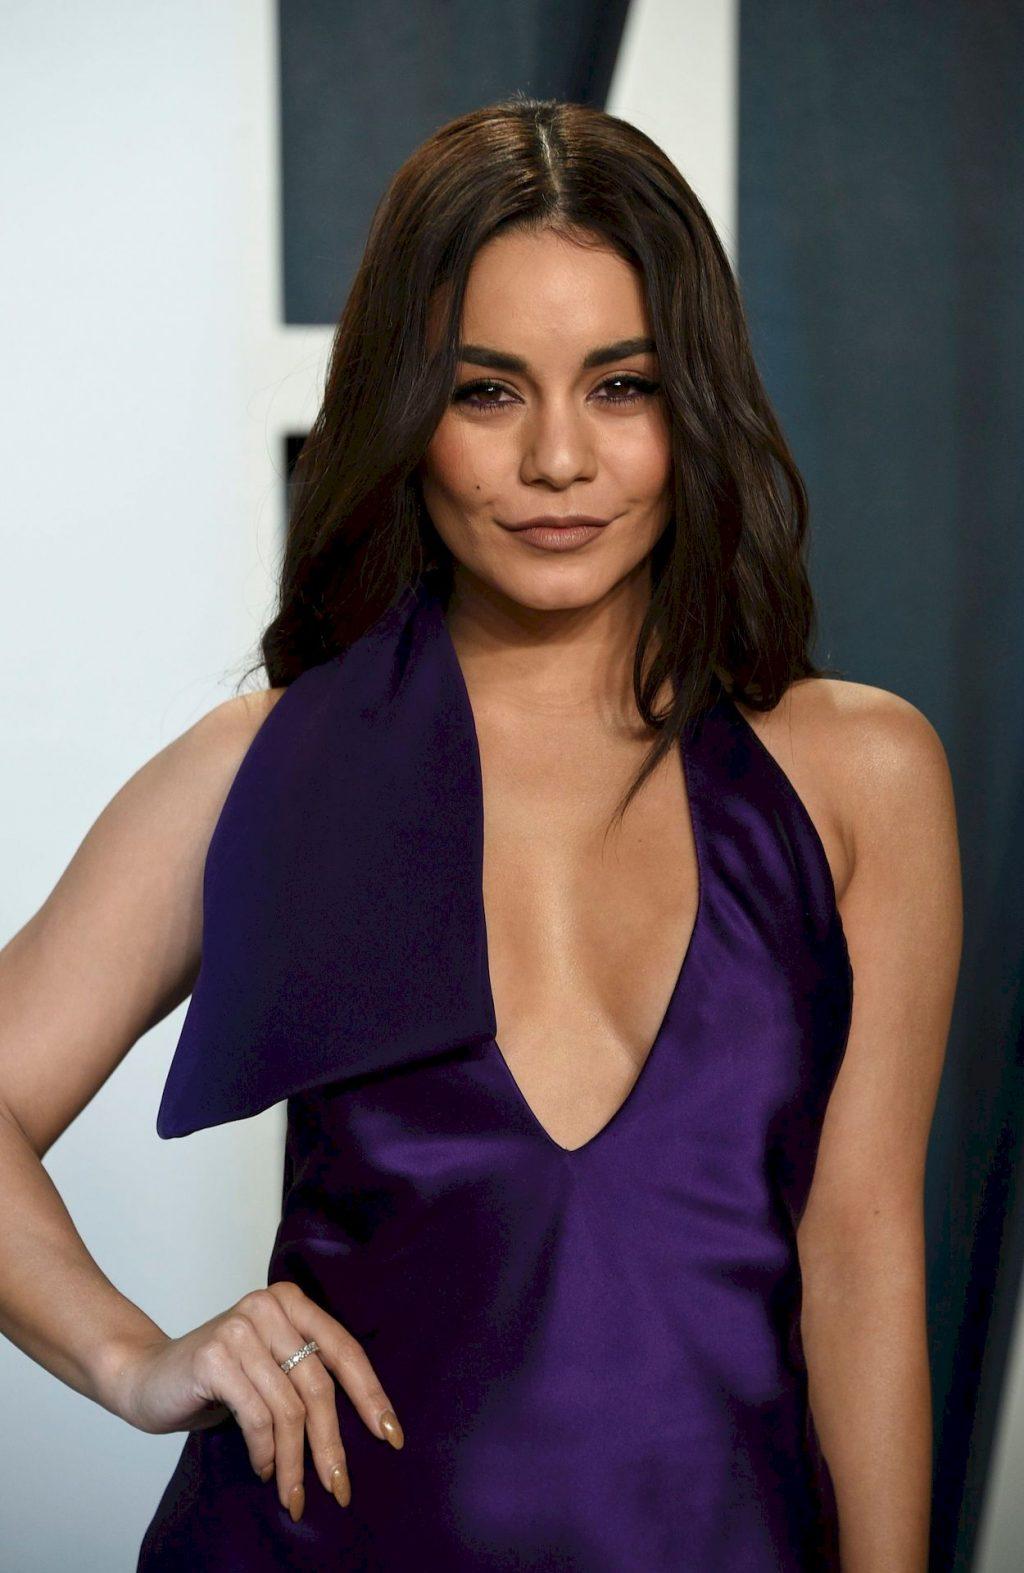 Vanessa Hudgens Looks Sexy in a Purple Dress at the Vanity Fair Oscar Party (45 Photos)